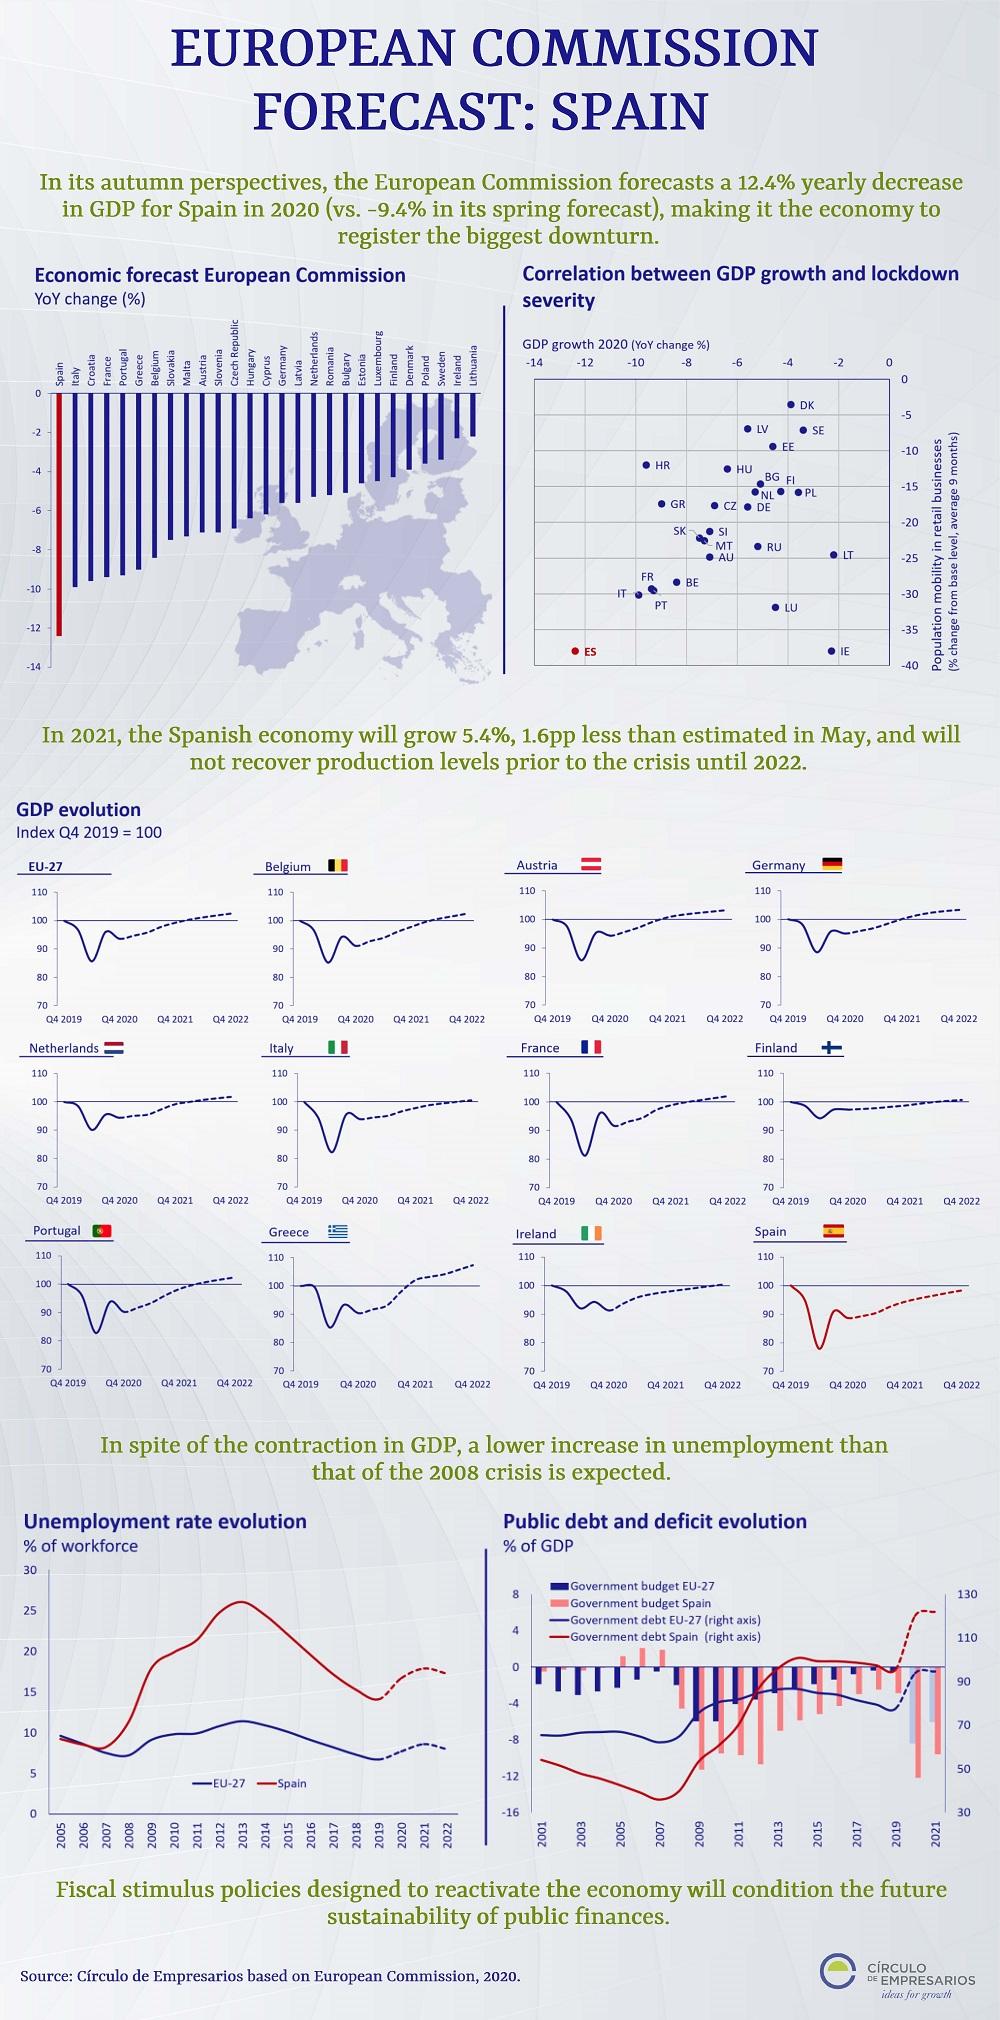 European-Commission-Forecasts-Spain-infographic-November-2020-Circulo-de-Empresarios